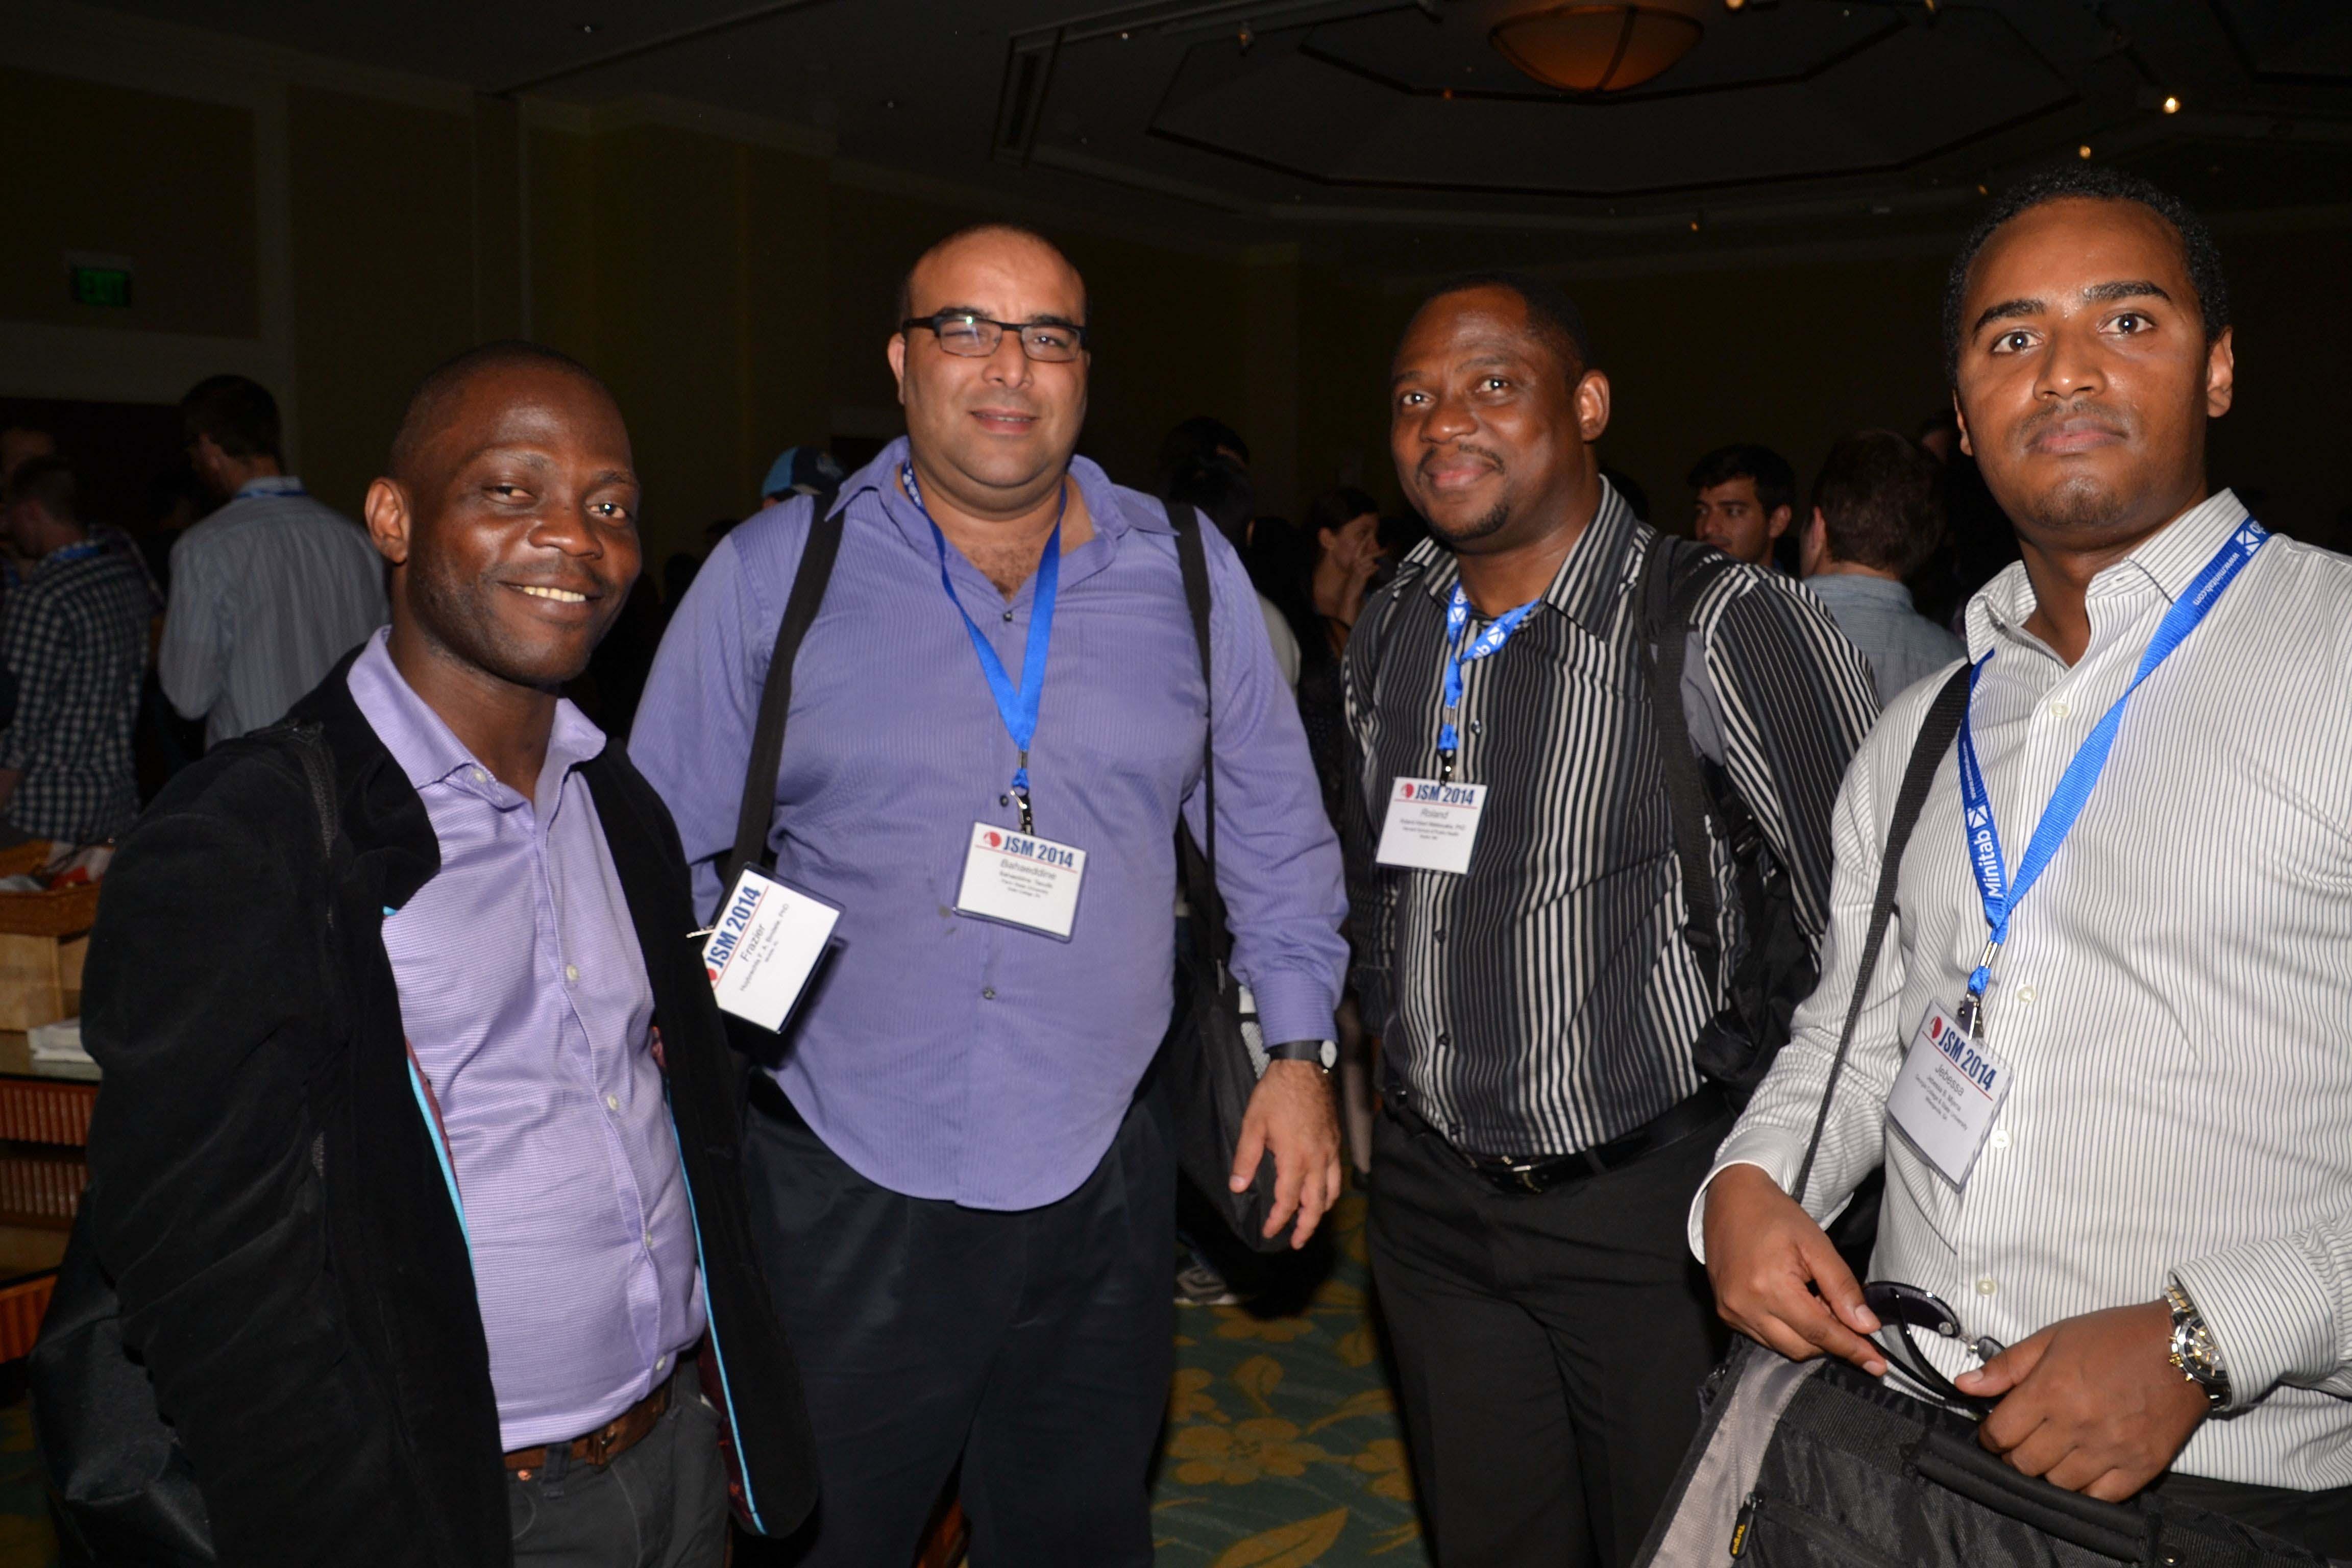 Frazier Bindele, Bahaeddine Taoufik, Roland Albert Matsouaka, and Jebessa Mijena take part in the Student Mixer